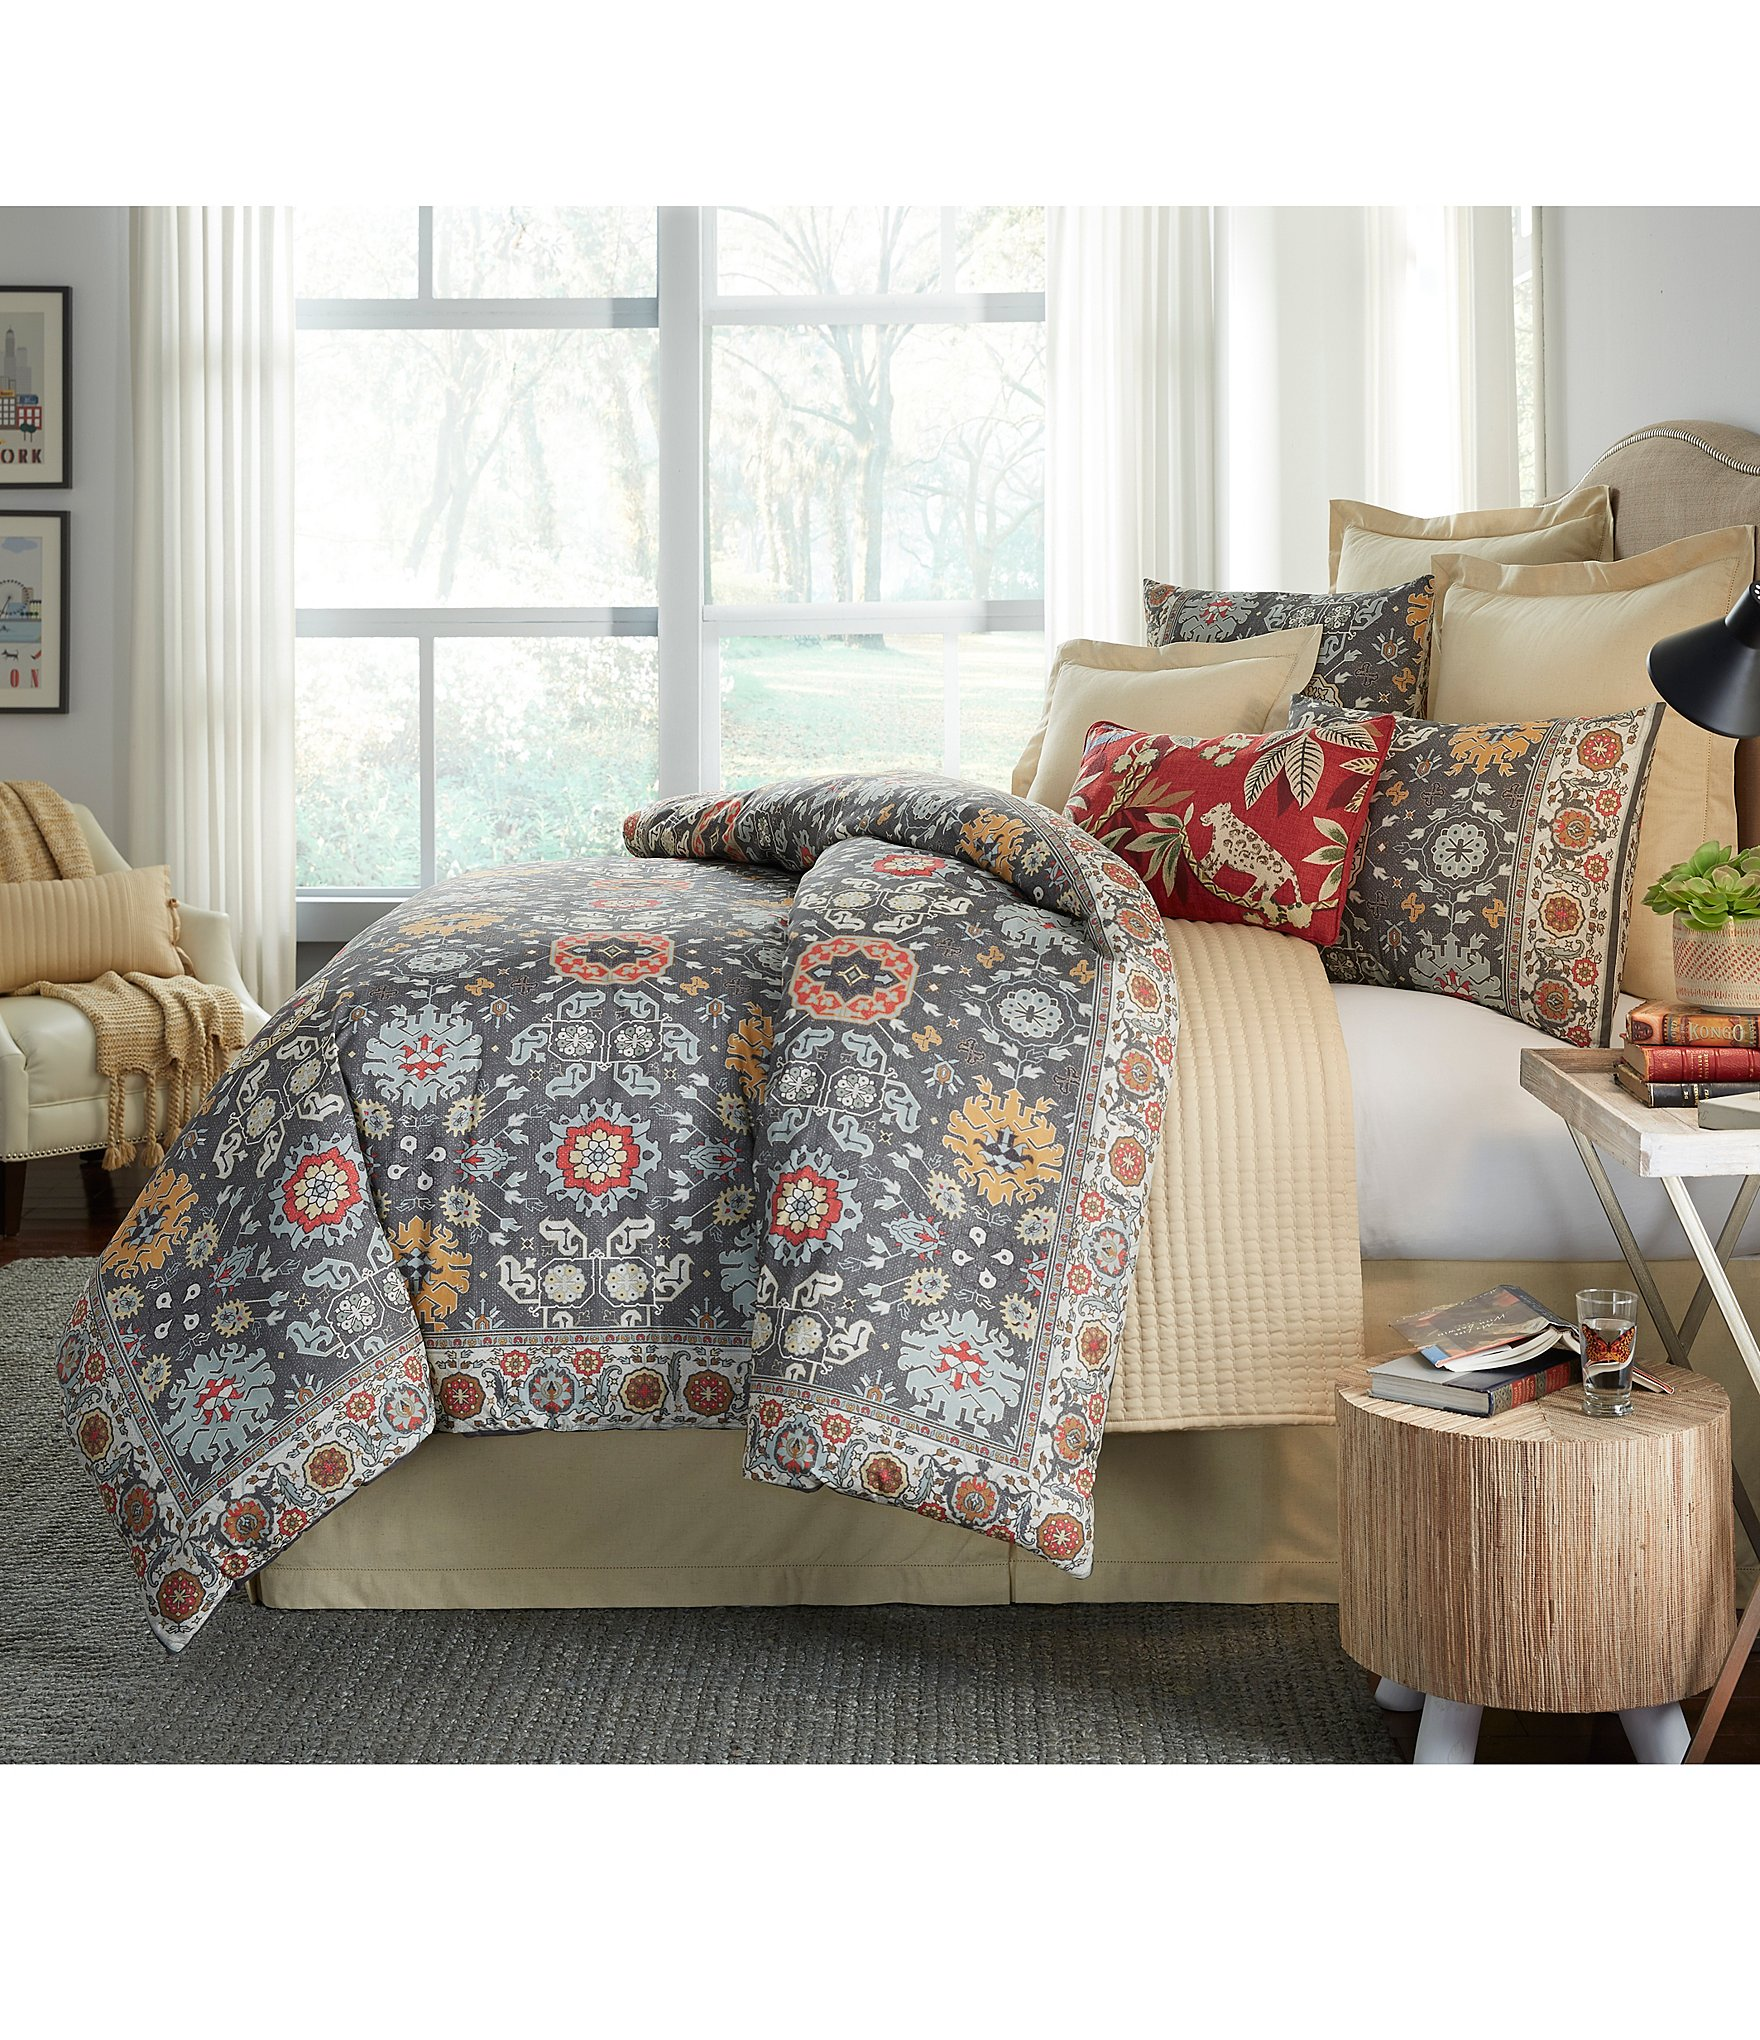 Nfl bedding for boys - Nfl Bedding For Boys 58